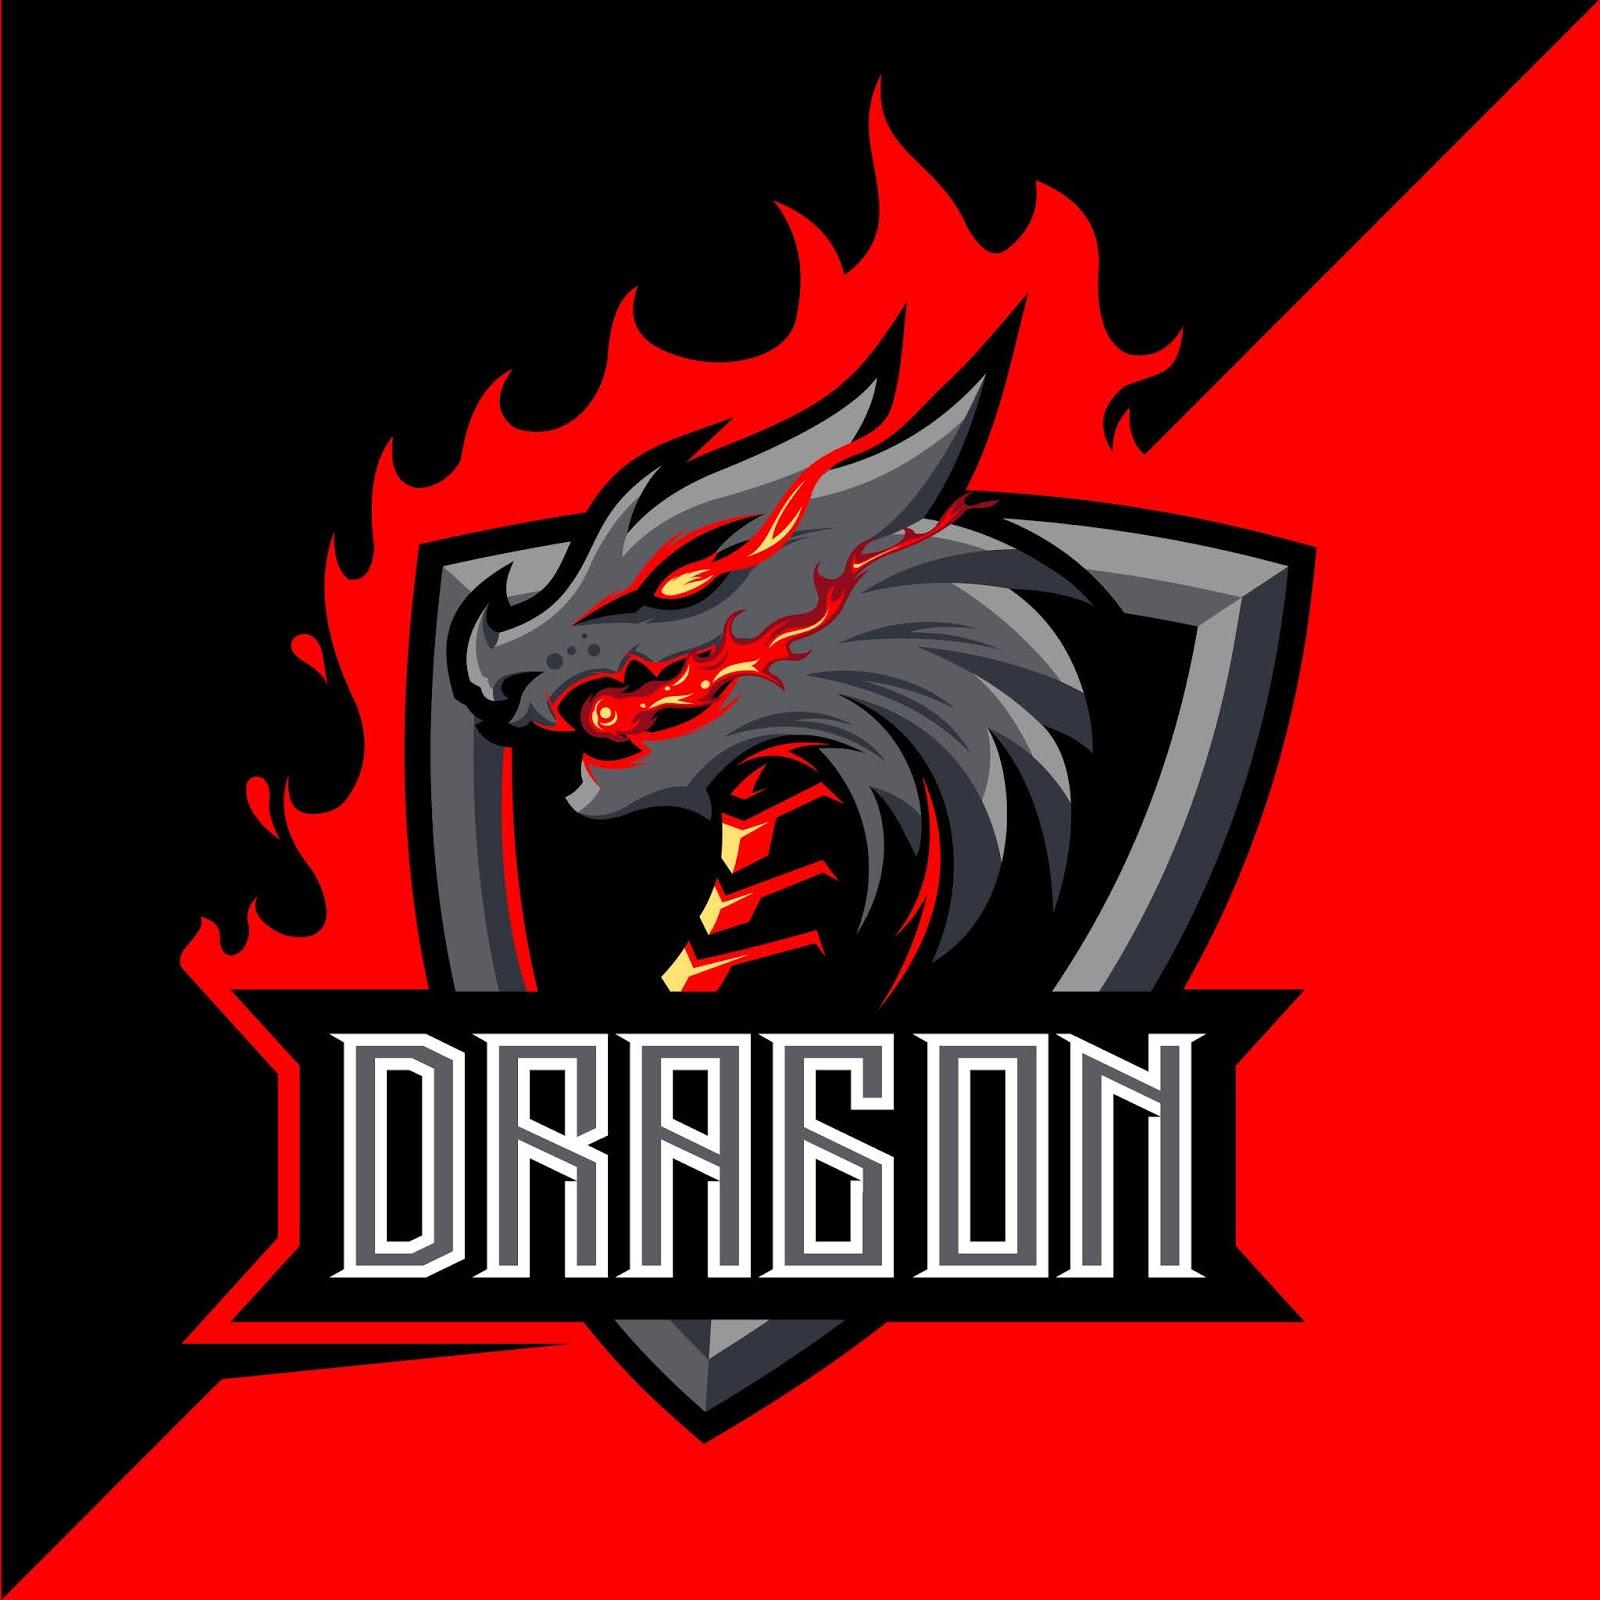 Dragon Fire Mascot Esport Logo Design Free Download Vector CDR, AI, EPS and PNG Formats